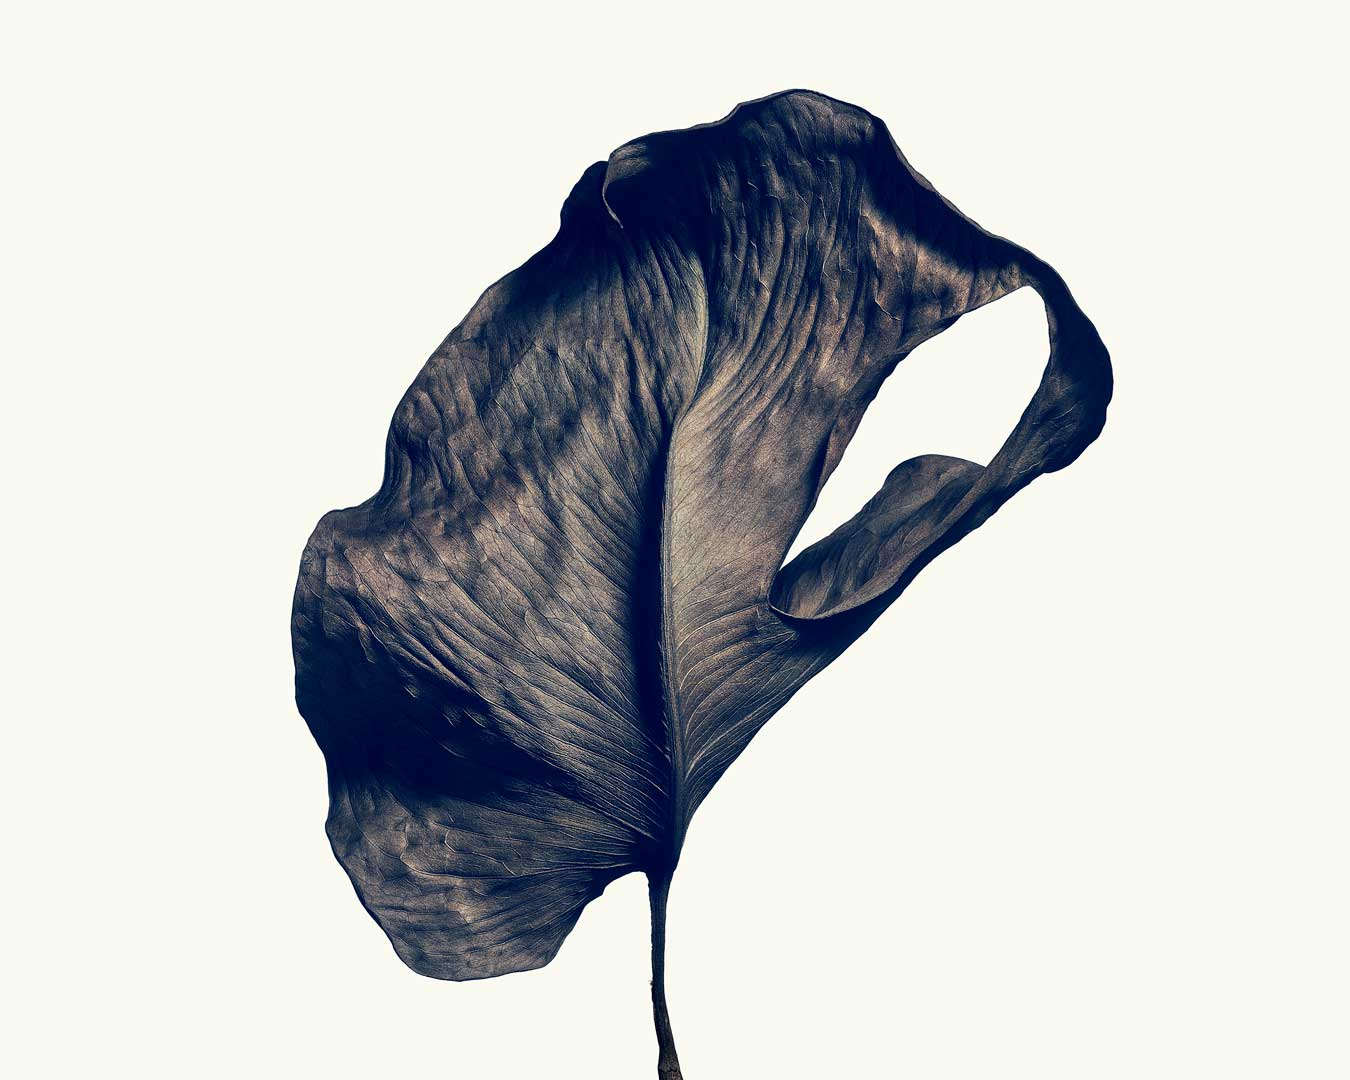 black-and-white-macro-image-of-a monstera-leaf-by-isamu-sawa